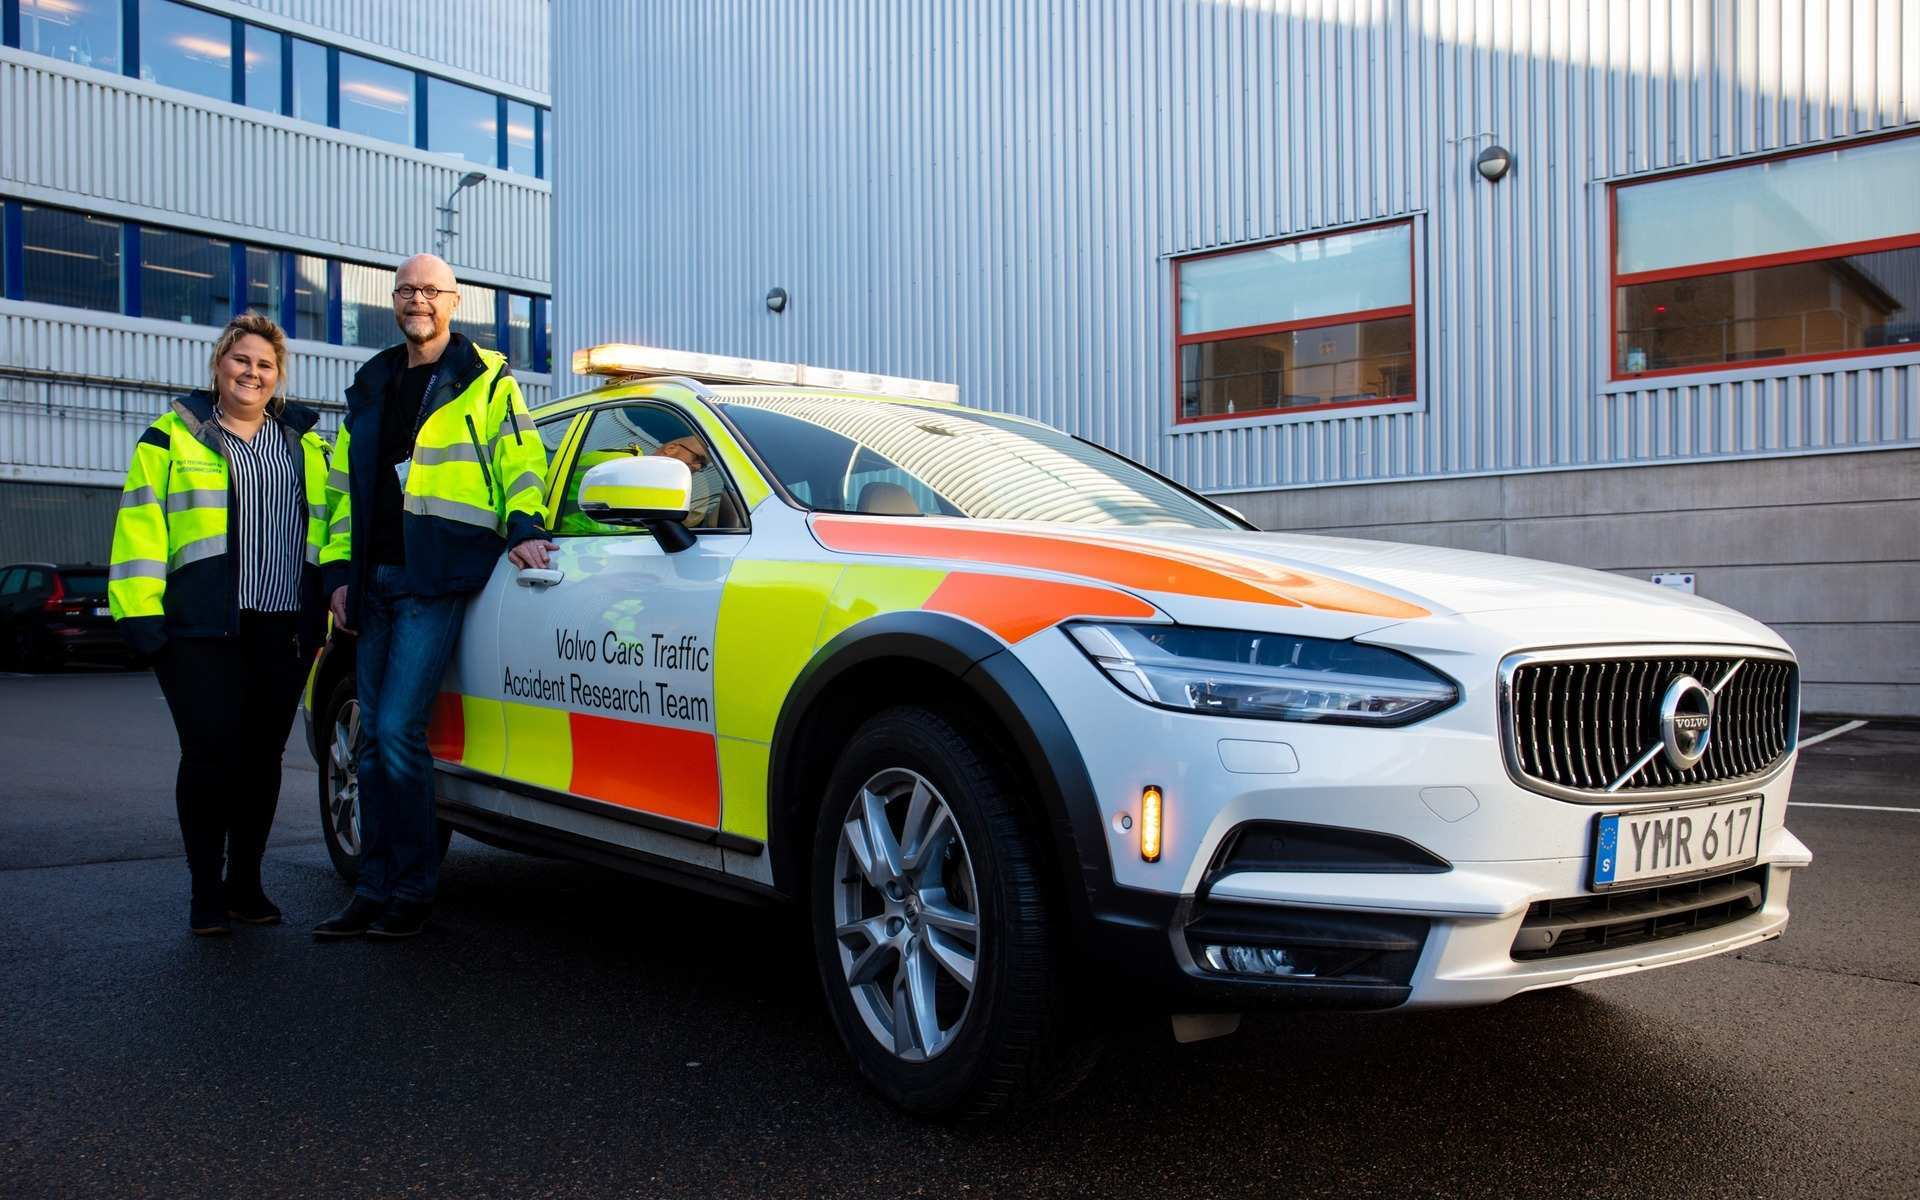 85 New Volvo Crash Proof Car 2020 New Concept by Volvo Crash Proof Car 2020